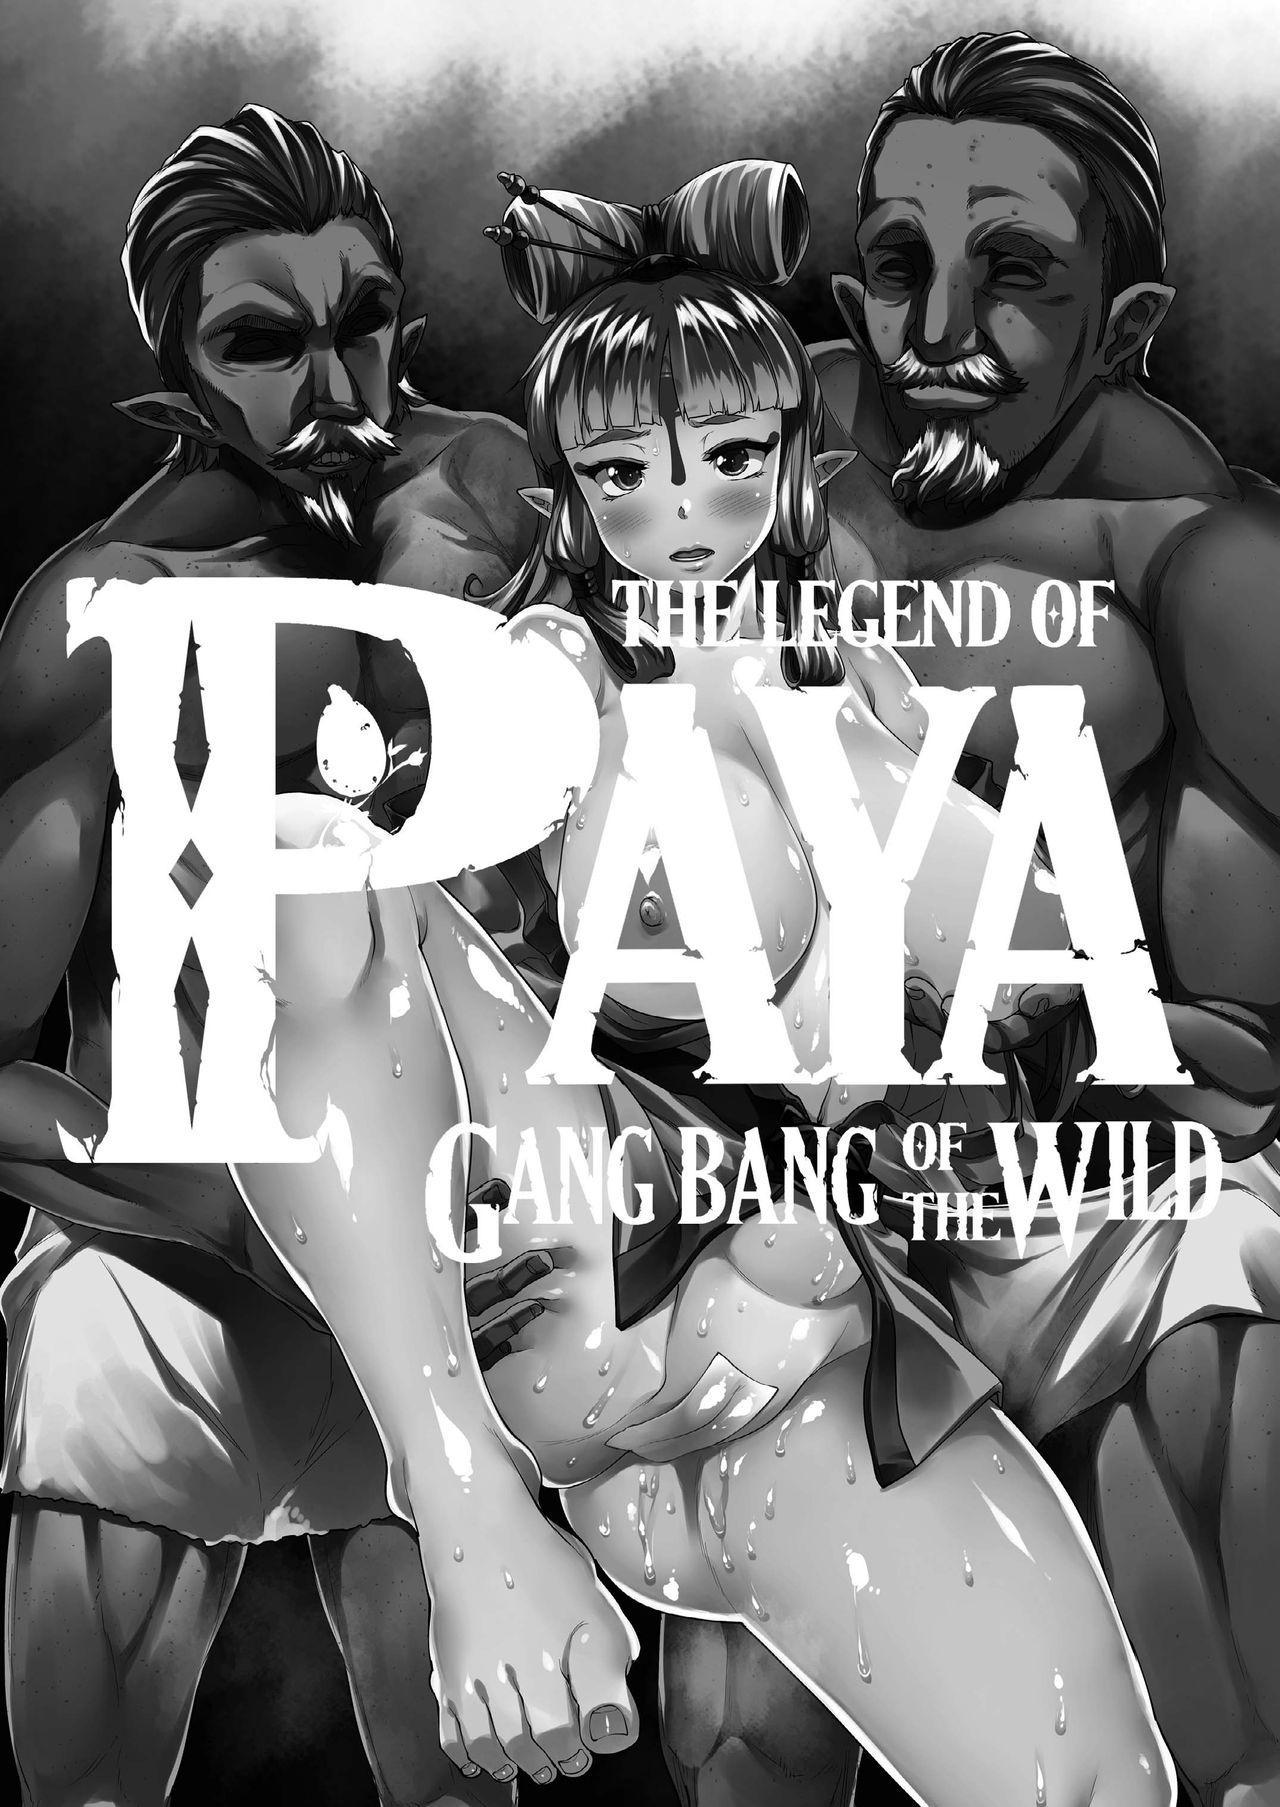 THE LEGEND OF PAYA GANG BANG OF THE WILD 2